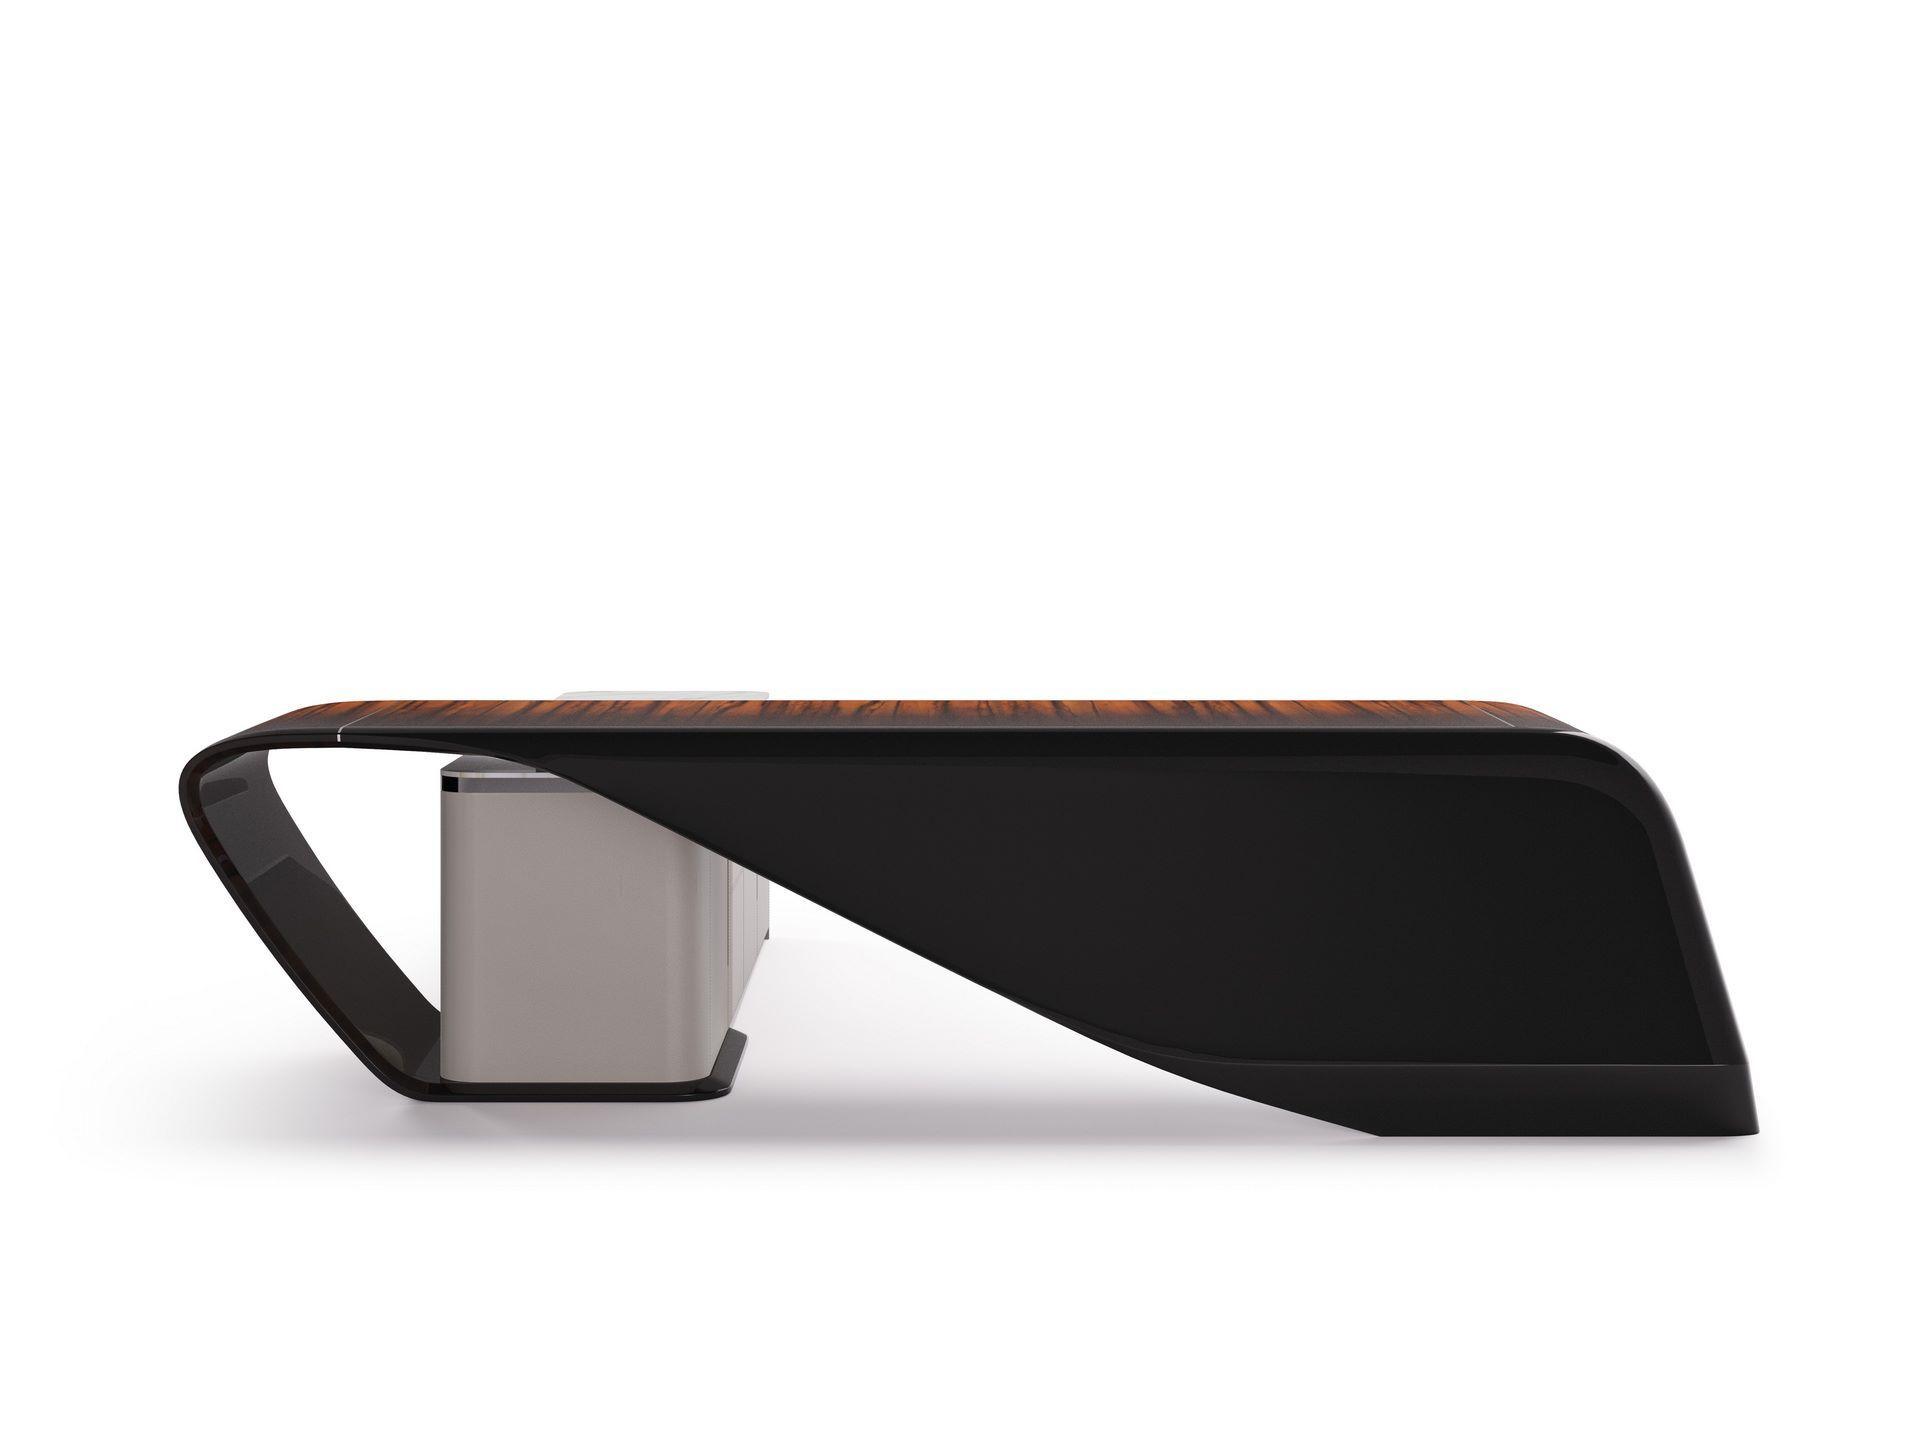 Bentley-Home-Collection-Ramsey-3-seater-sofa-10_2